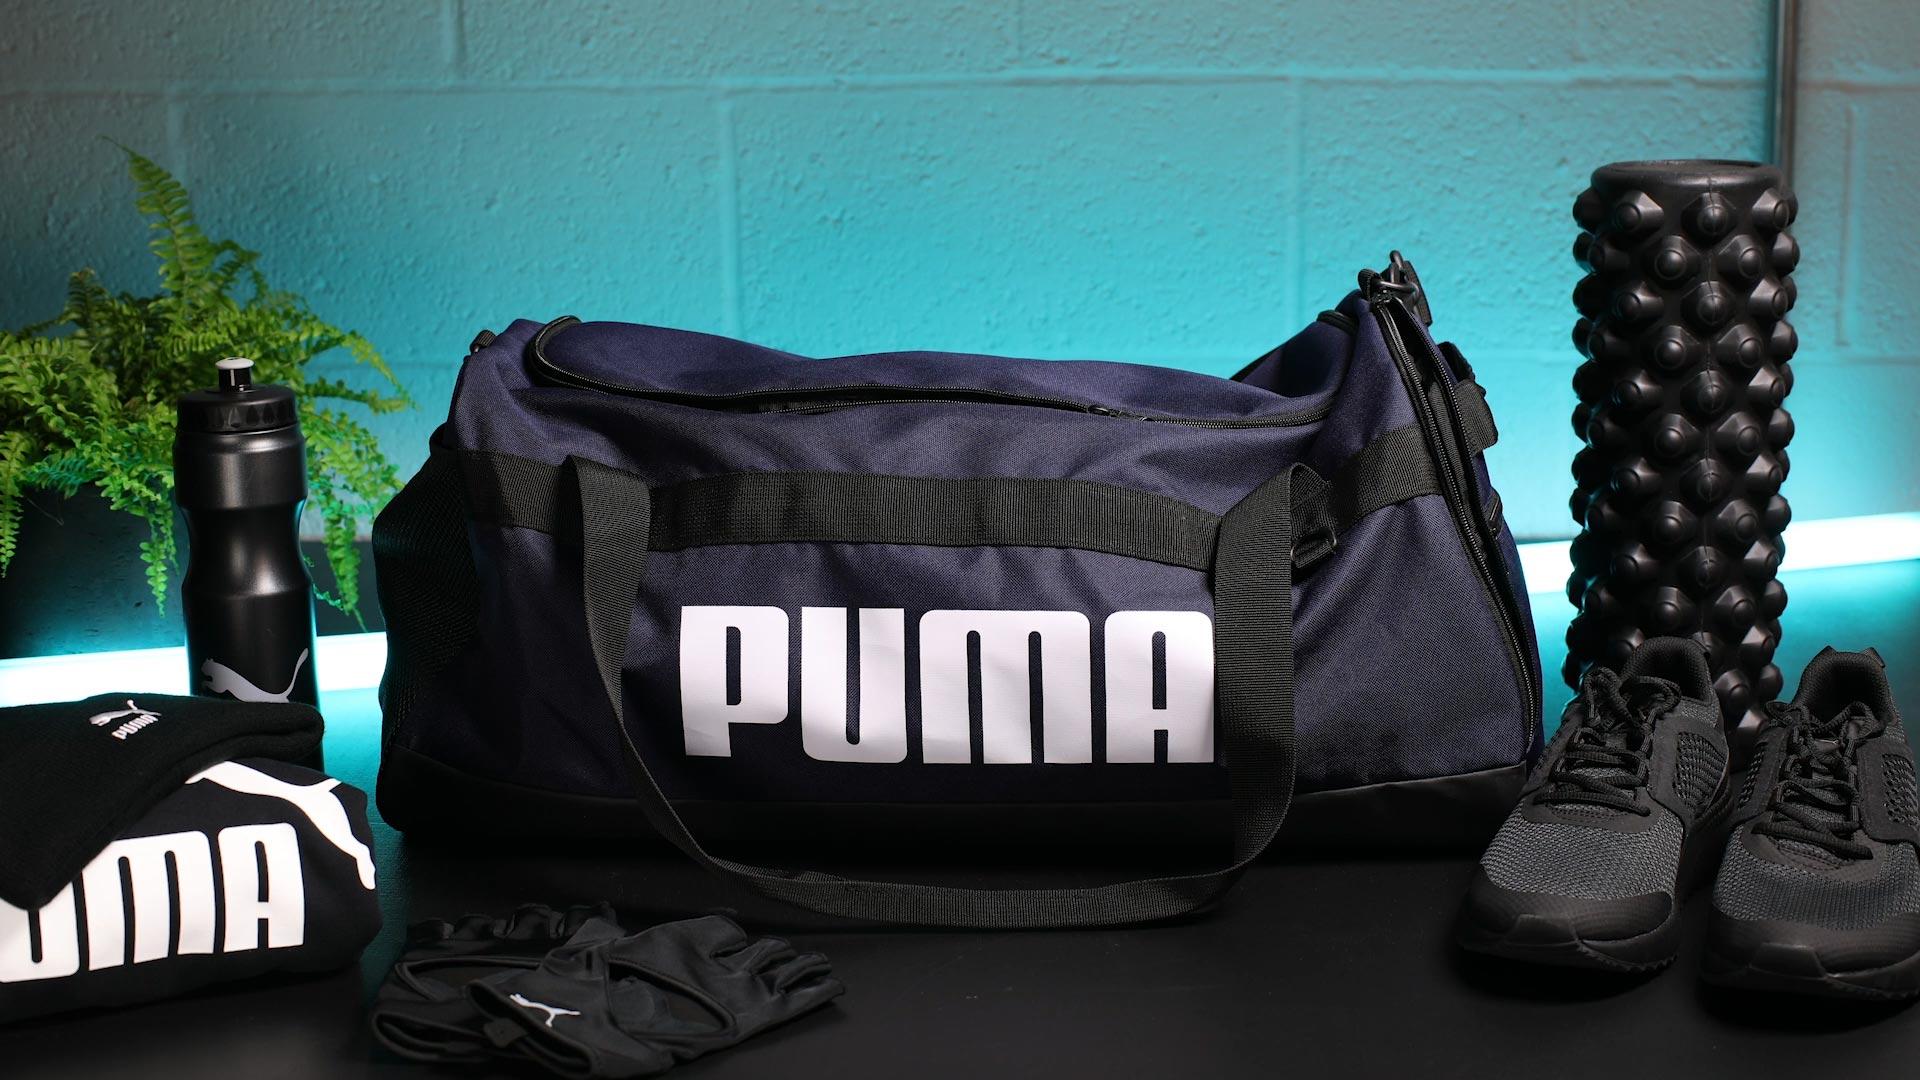 Neatly arranged black objects around Puma sports bag stop motion